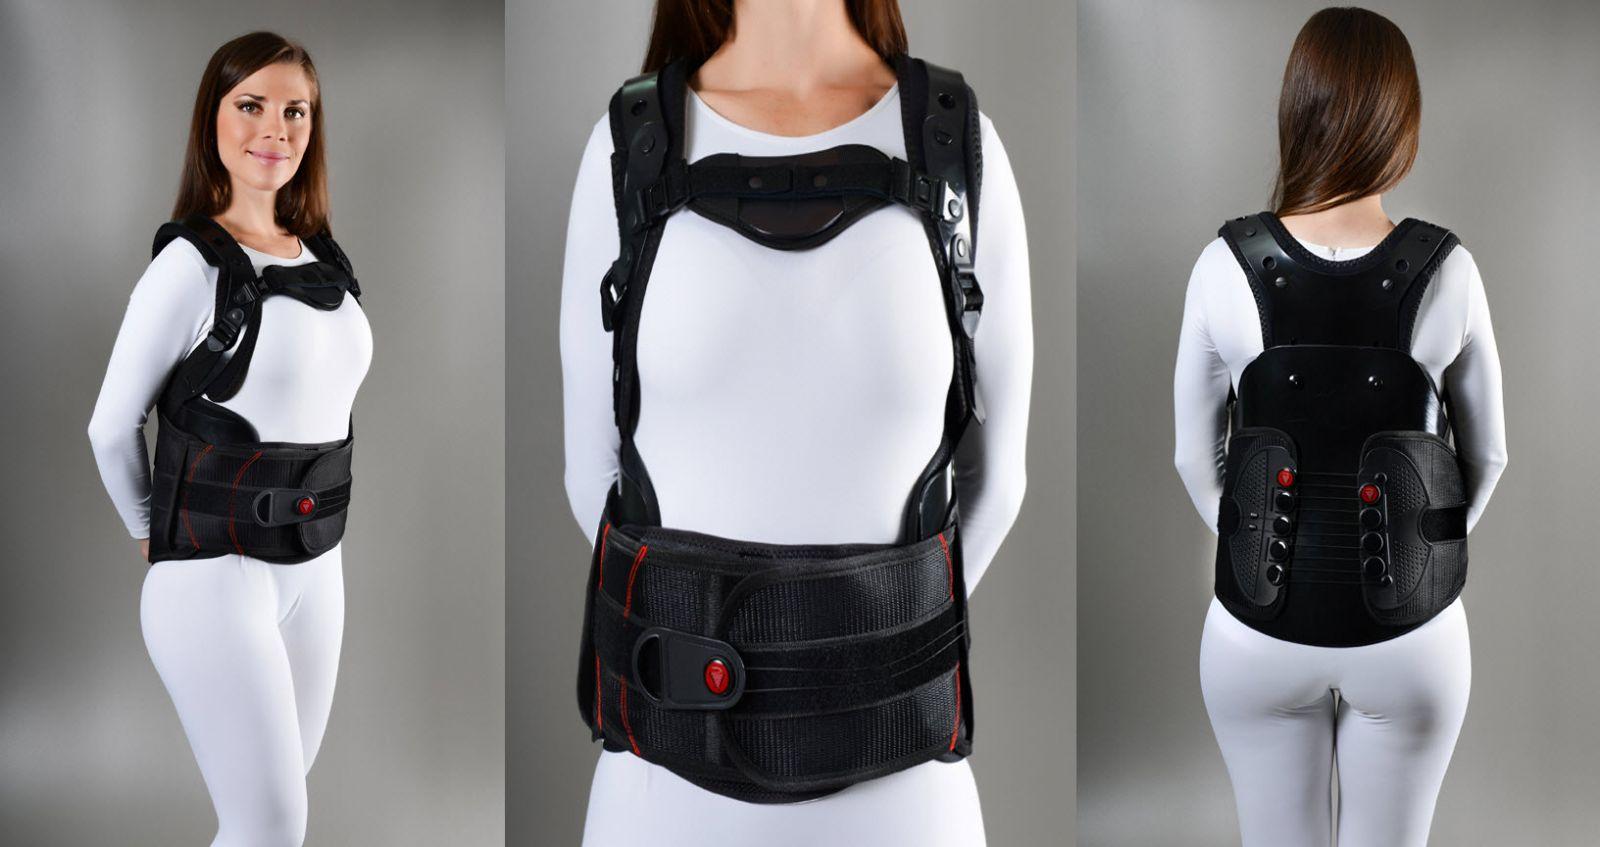 venum1 tlso back brace buy now free shipping